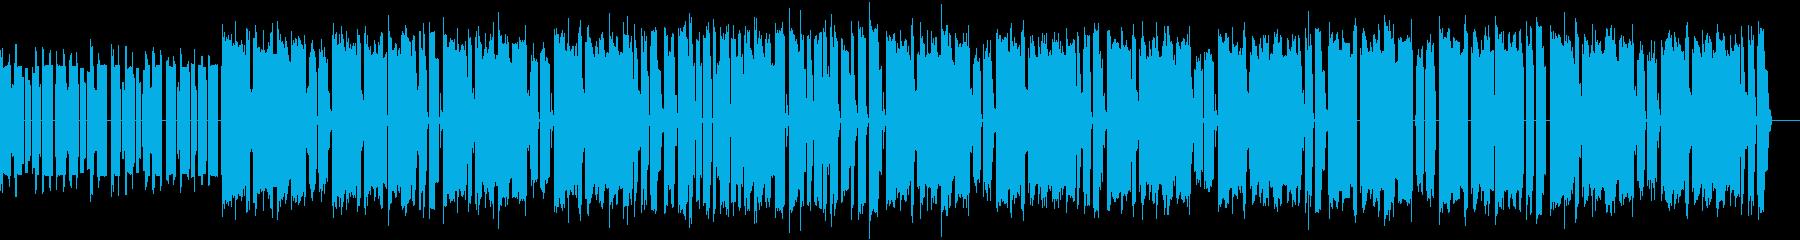 GAME001のレトロバージョンですの再生済みの波形